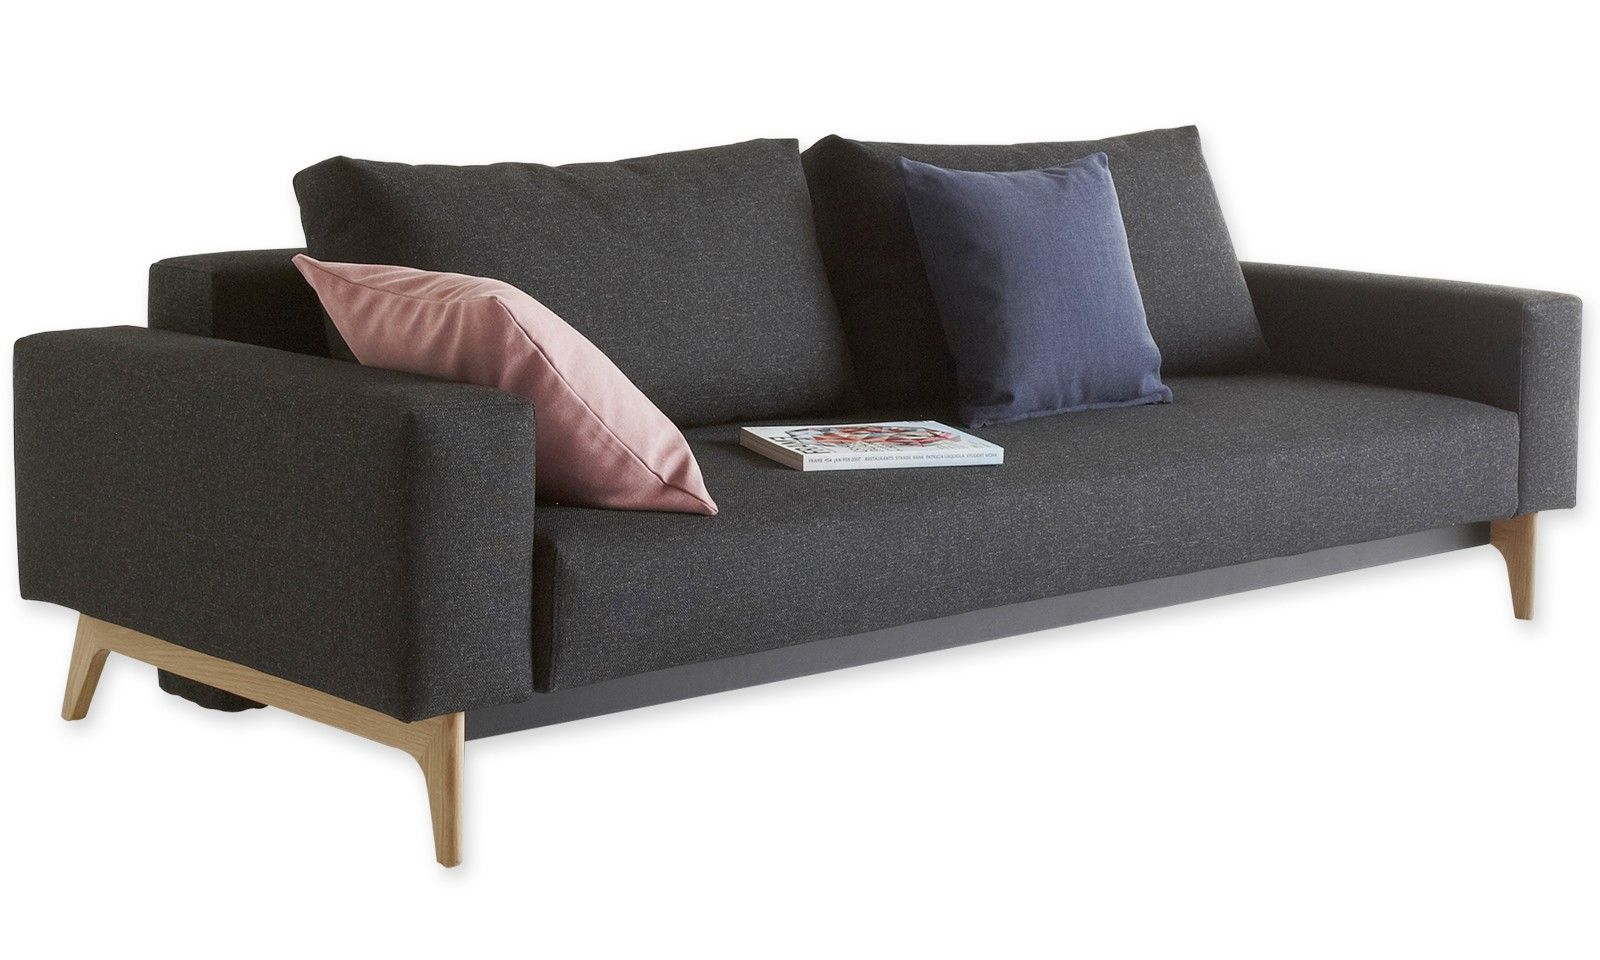 sofa schlaf elegant sitz sofa schlafsofa ledersofa gste schlaf couch polster neu palermobx with. Black Bedroom Furniture Sets. Home Design Ideas